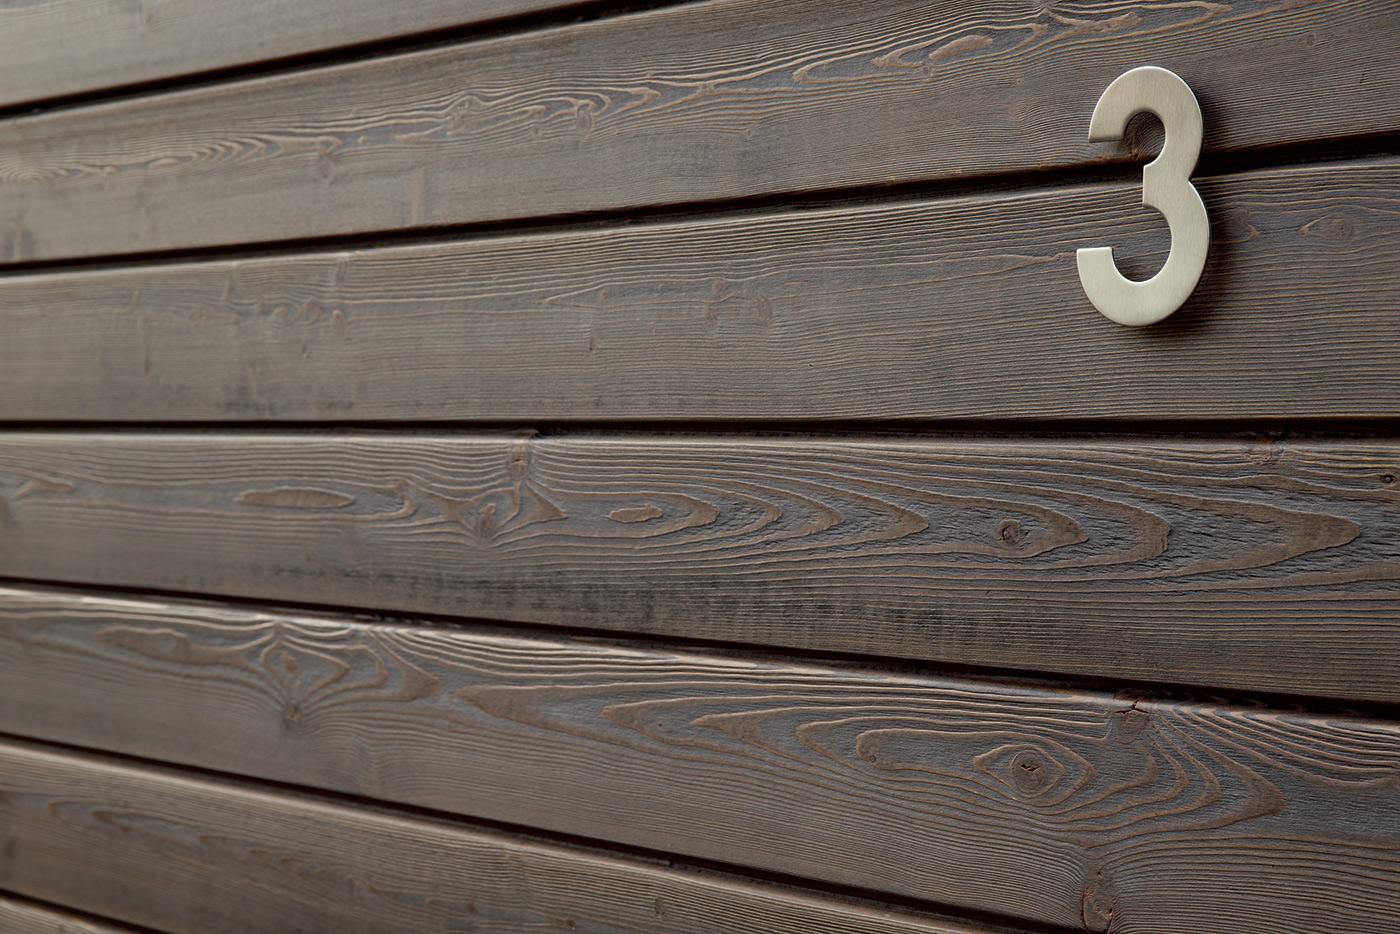 maison bardage gris bardage facade bardage bois clin bois ide terrasse castorama extension bois. Black Bedroom Furniture Sets. Home Design Ideas